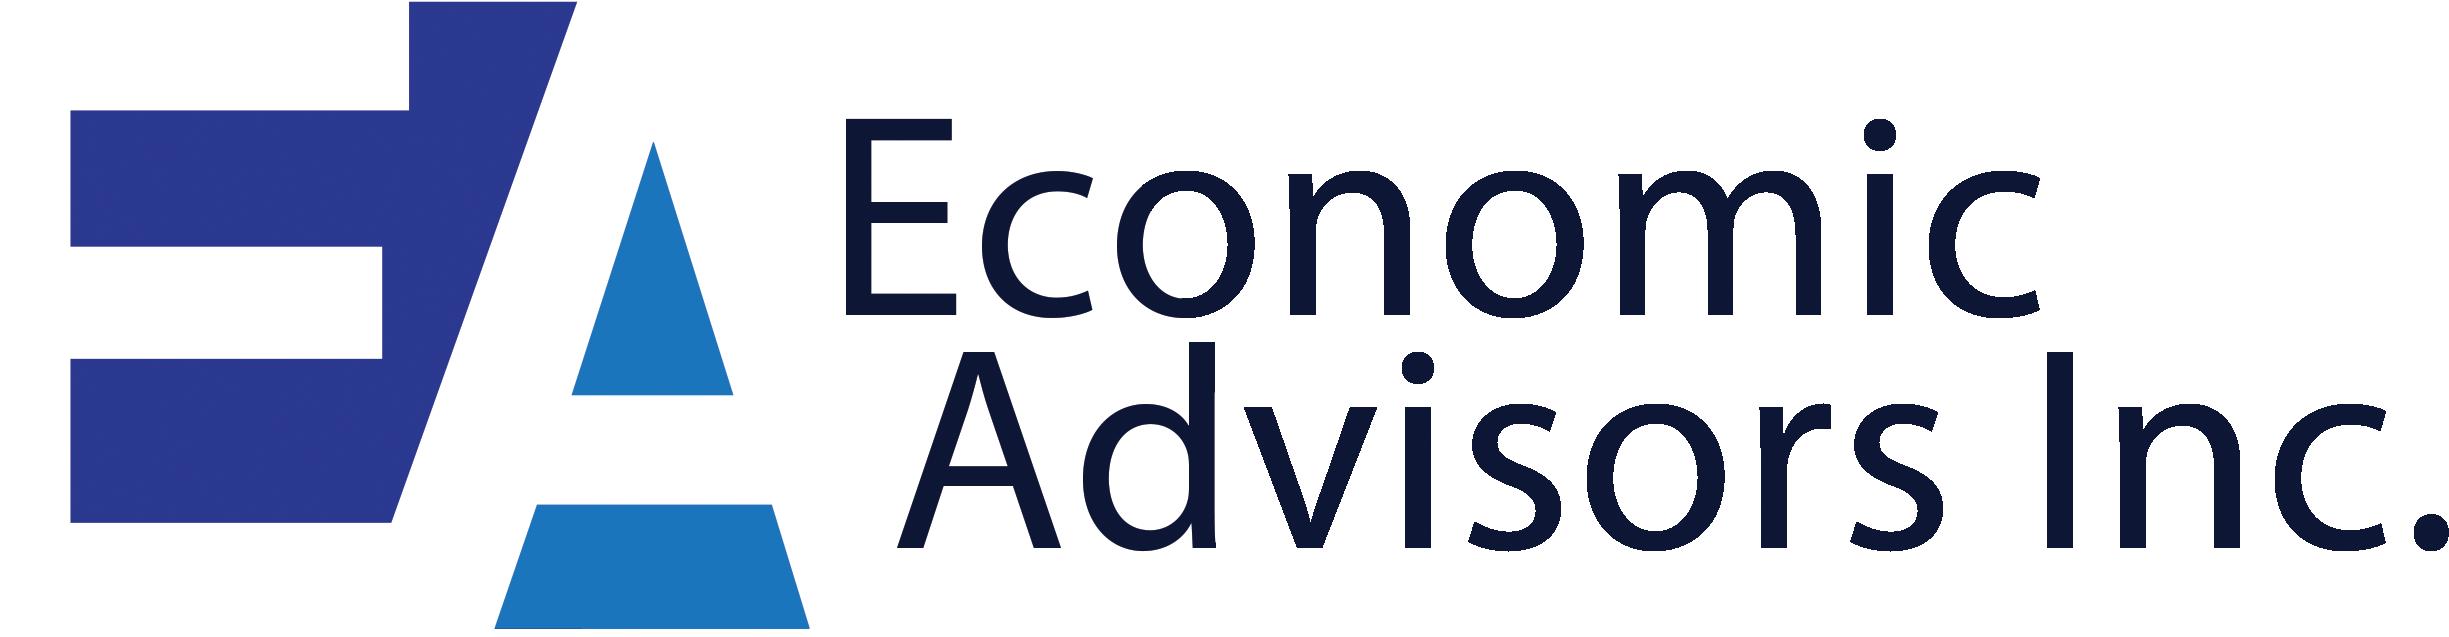 Economic Advisors Inc.